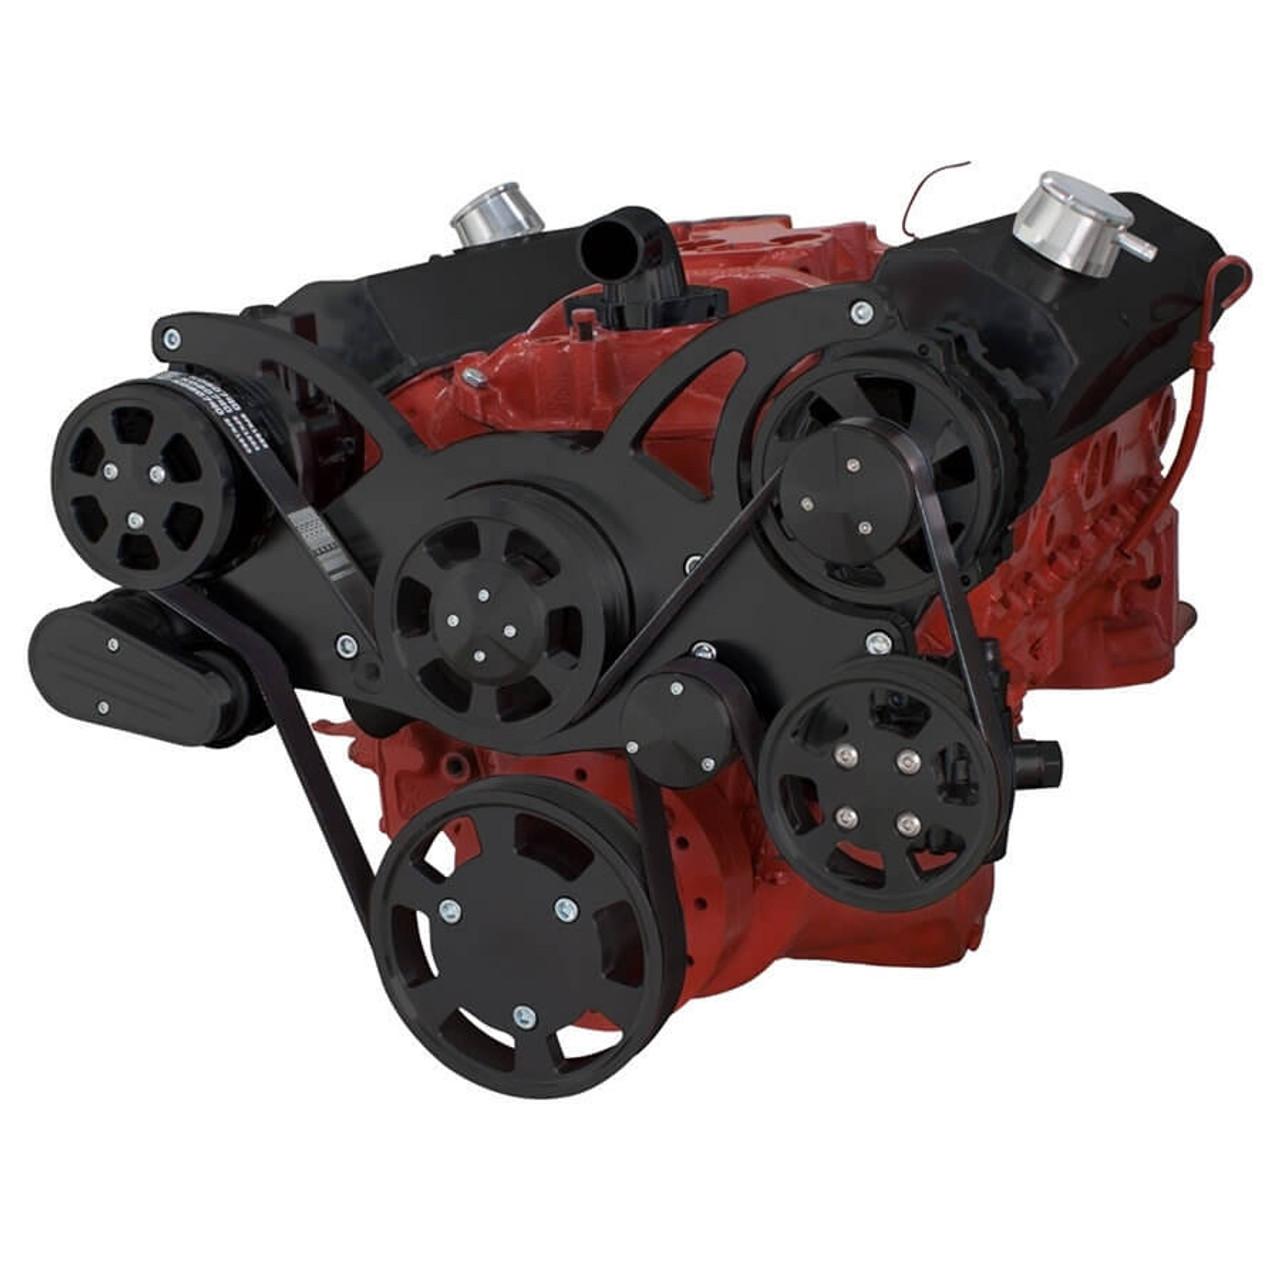 black serpentine conversion kit for small block chevy 283 350 400 rh cvfracing com